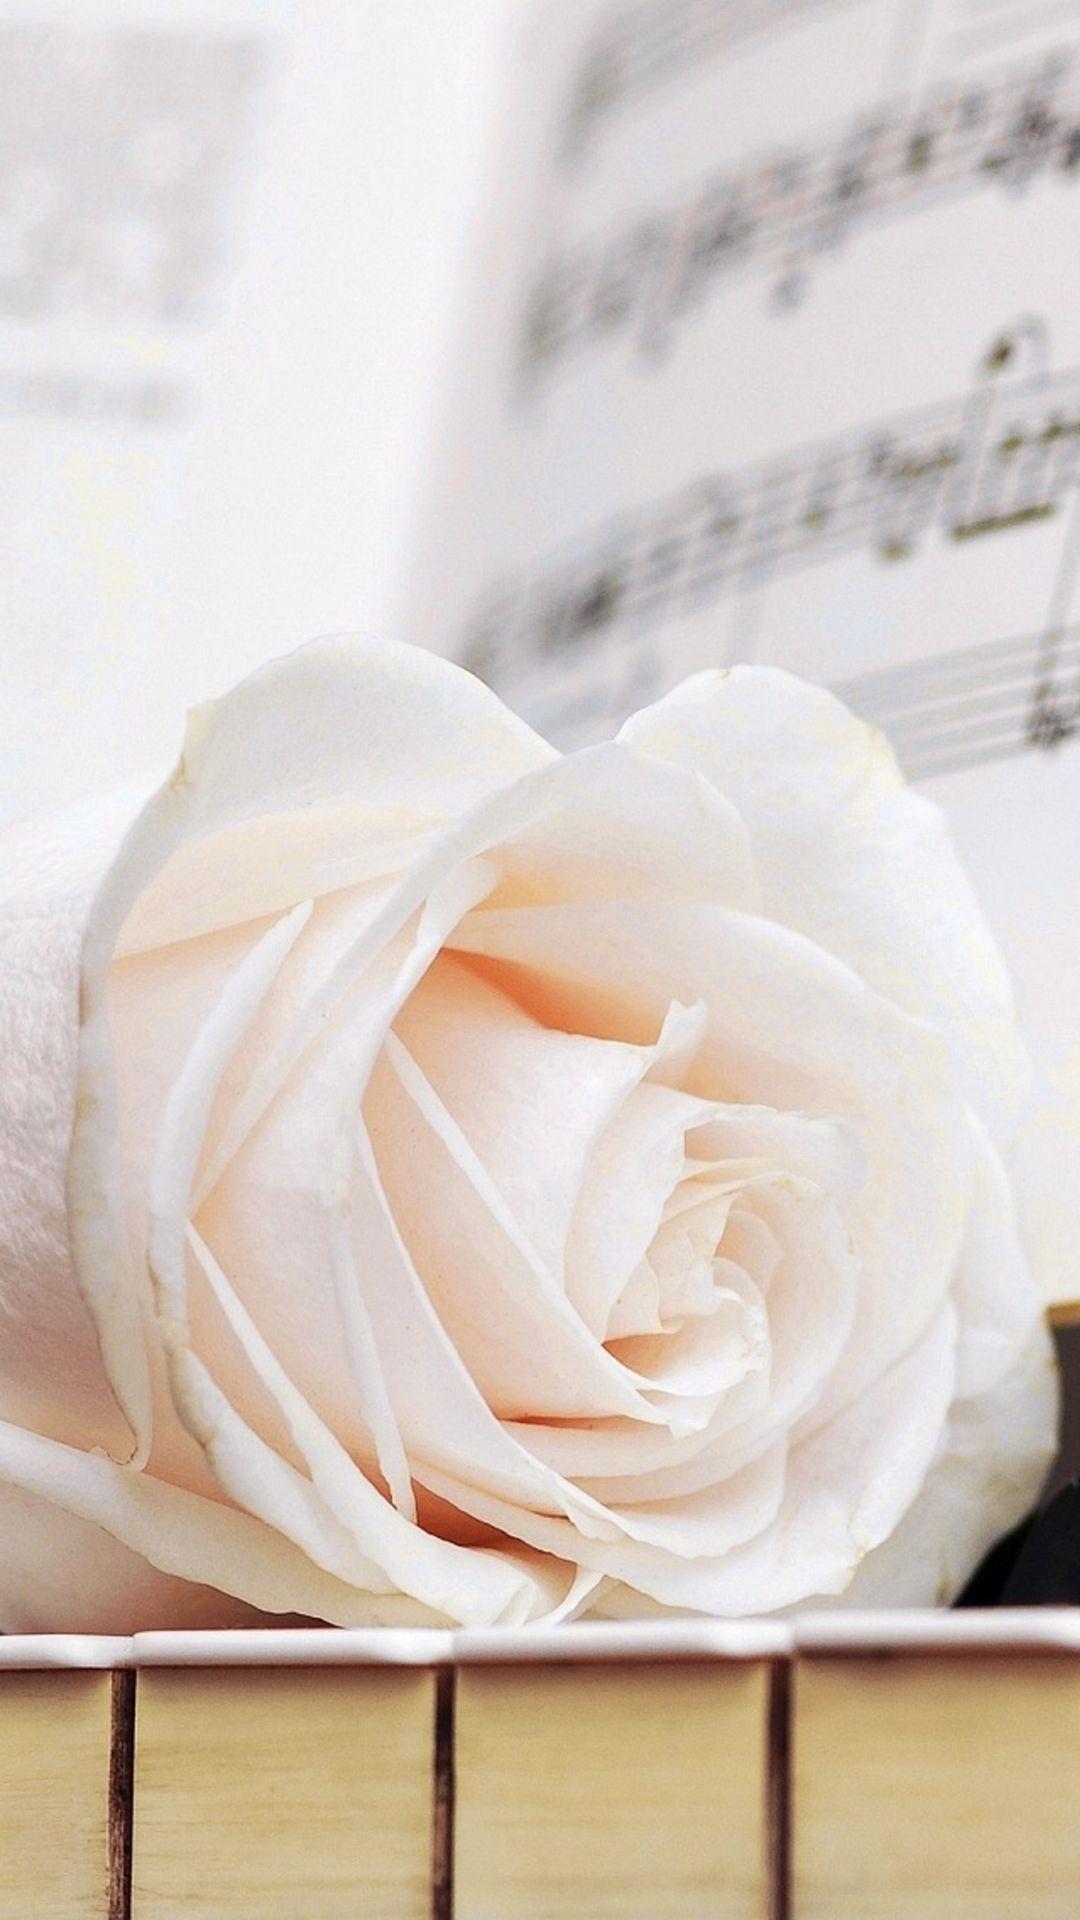 Pure Elegant Rose Flower Macro Music Note Book Iphone 8 Wallpapers